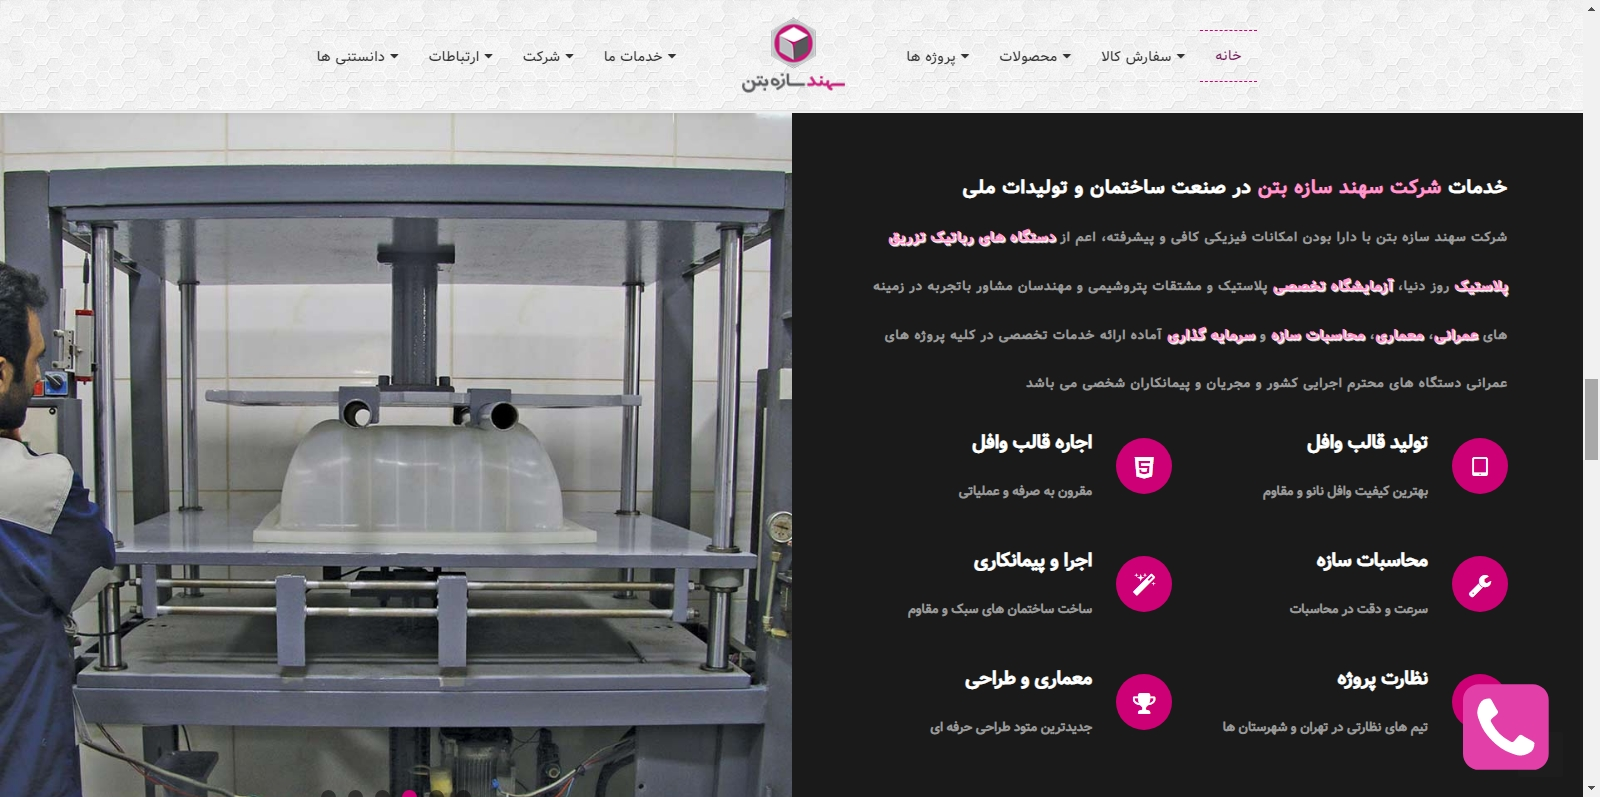 screenshot 20200525 214124 - sahandsazeh.co